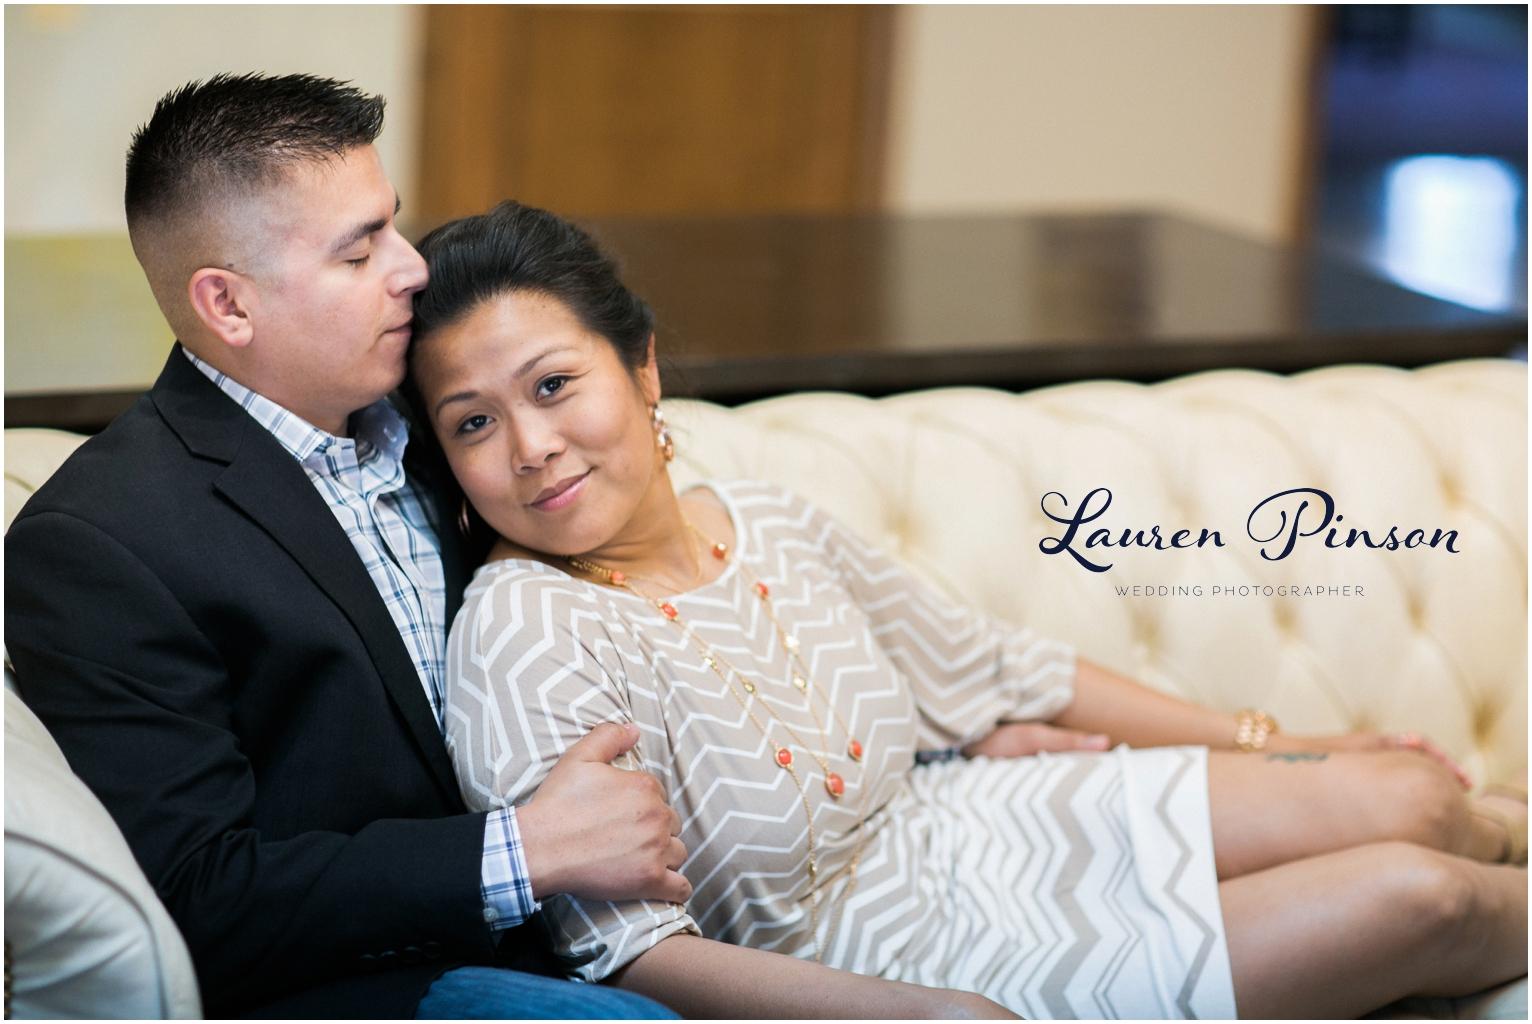 wichita-falls-wedding-photographer-engagement-session-texas-photography-oklahoma-engagement-wedding-photography_0606.jpg